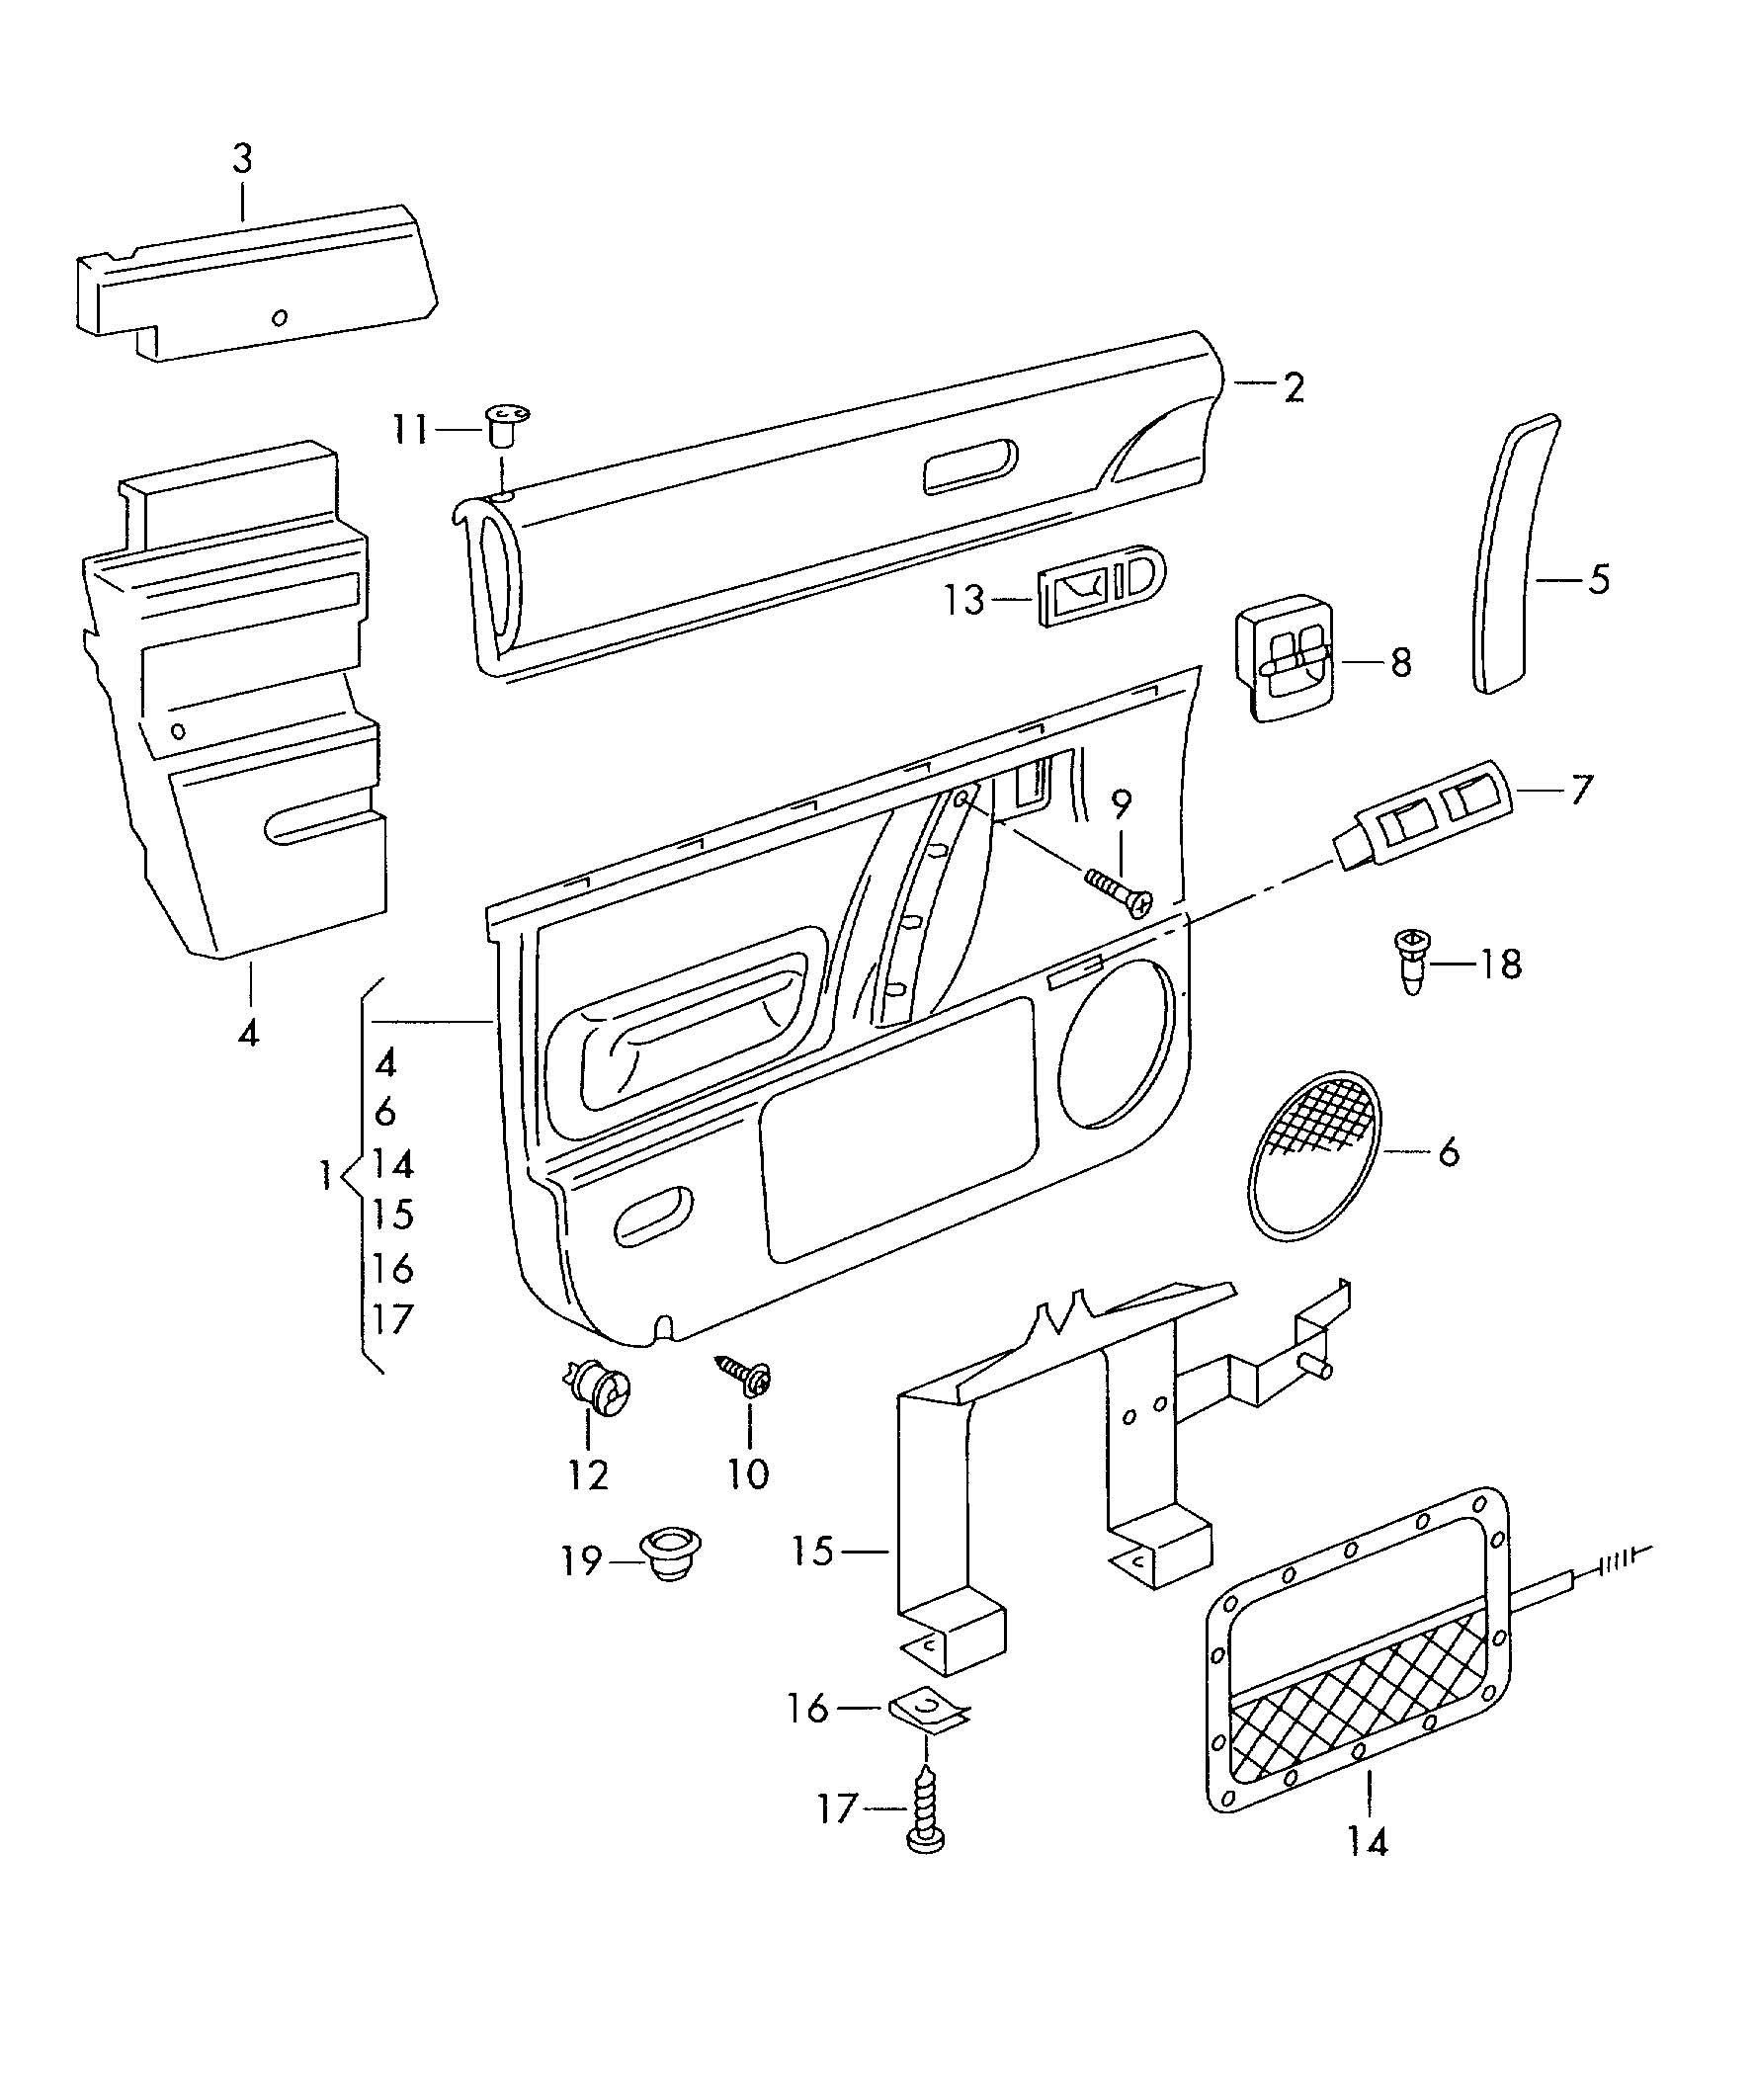 vw beetle wiring diagram moreover vw beetle wiring diagram on 1970 vw